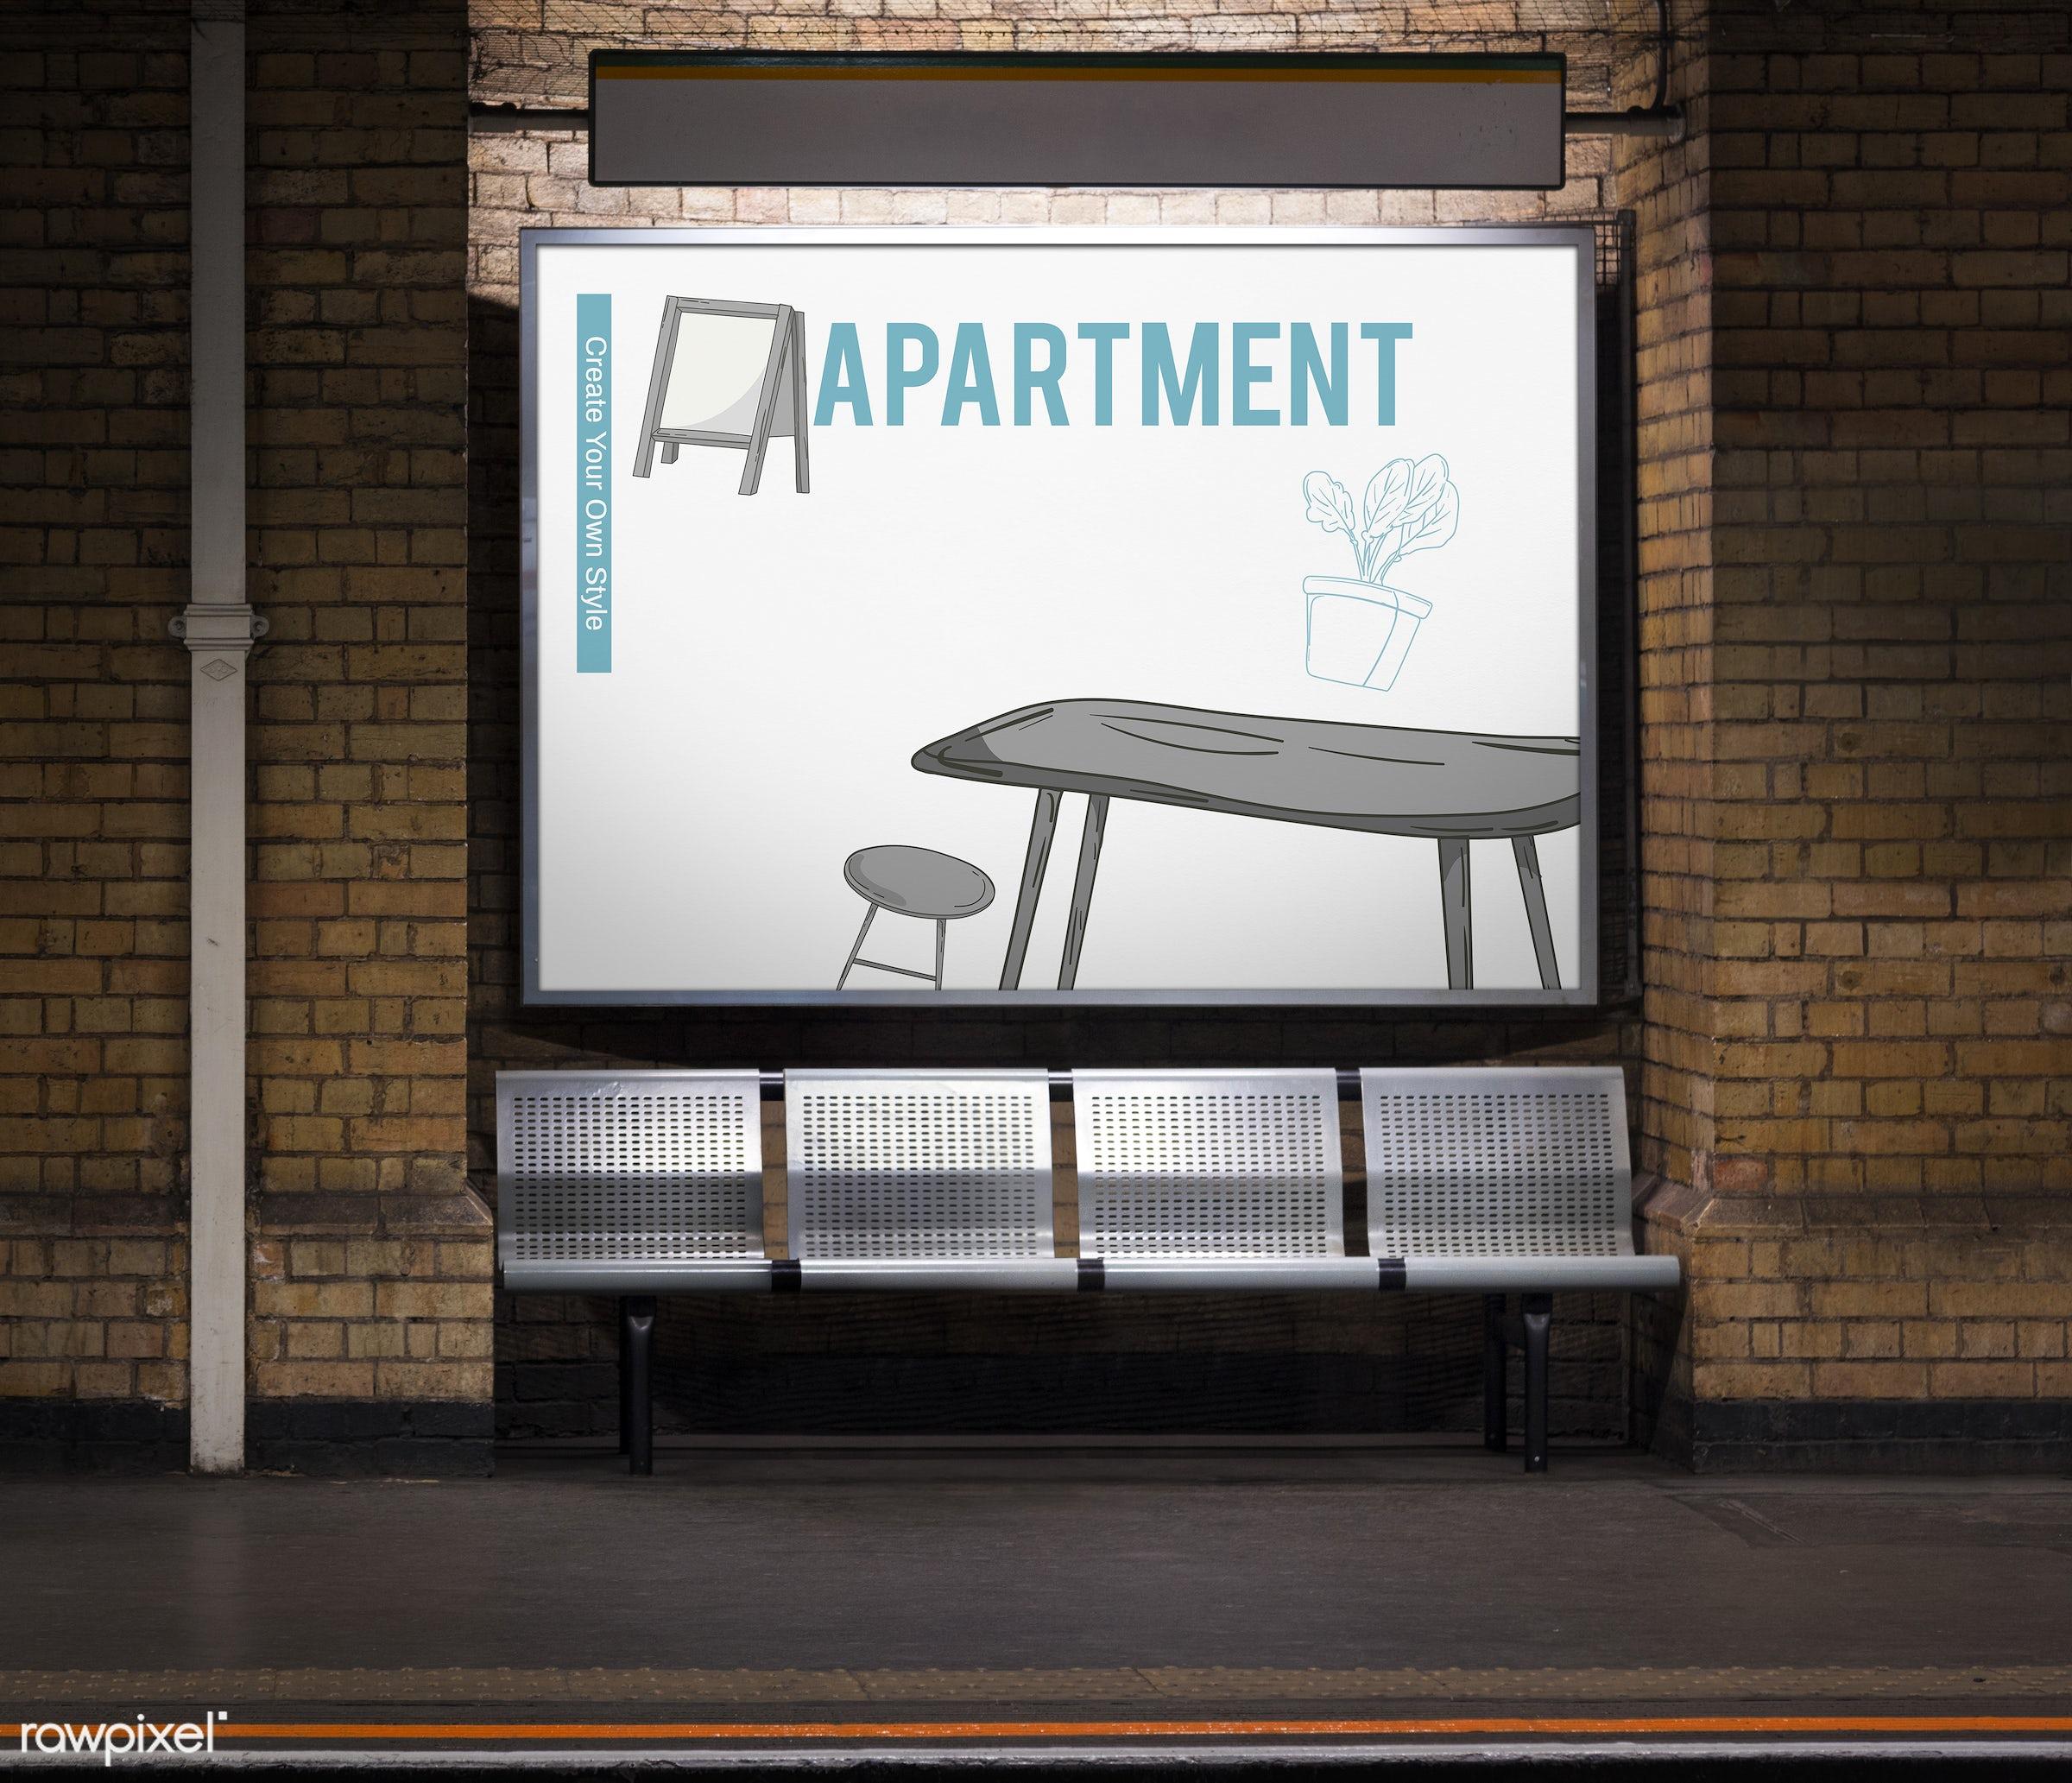 apartment, architecture, bricks, brickswall, building, carpet, carpeted, contemporary, counter, decoration, dio, elegance,...